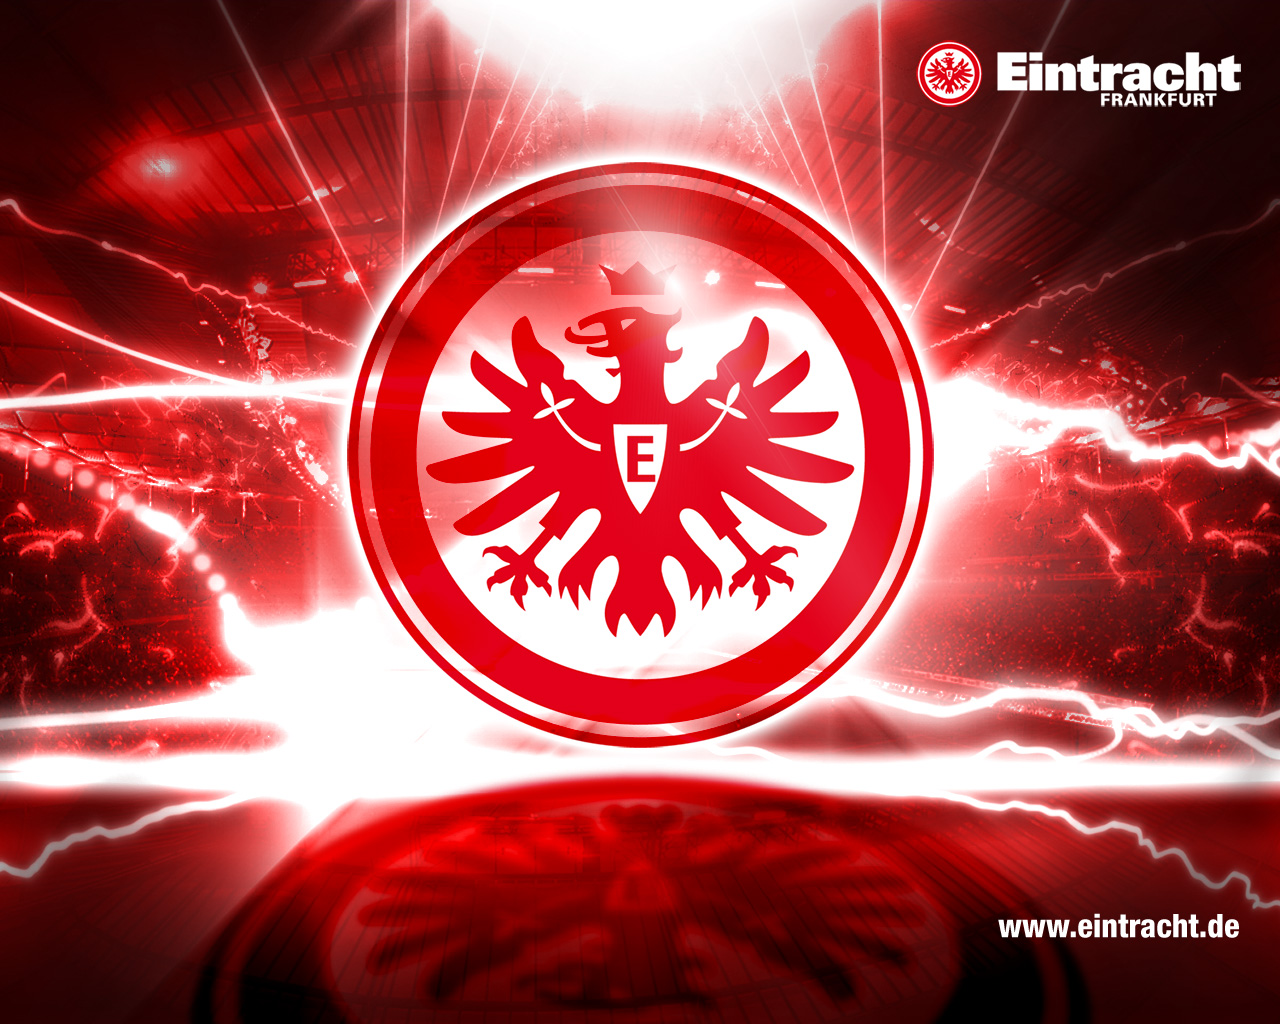 Eintracht Frankfurt Logos